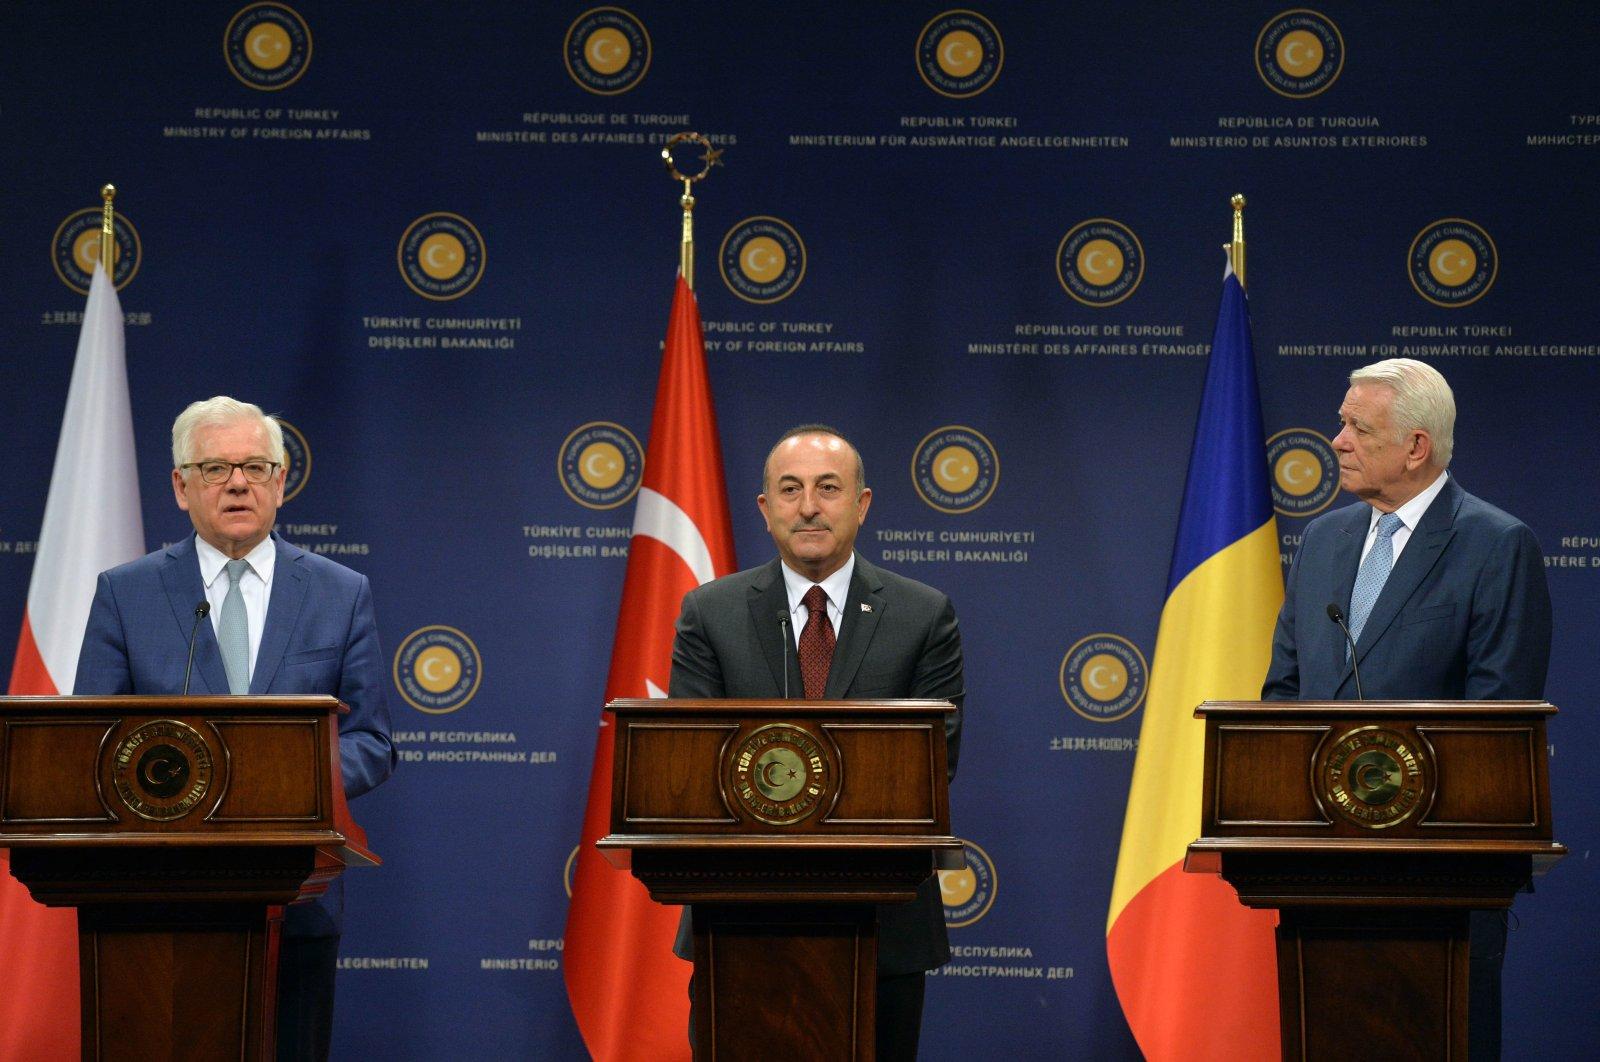 Foreign Minister Mevlüt Çavuşoğlu (center) attends news conference with Polish counterpart Jacek Czaputowicz and Romanian Foreign Minister Teodor Viorel Meleșcanu, in Ankara, Turkey April 19, 2019 (AA File Photo)